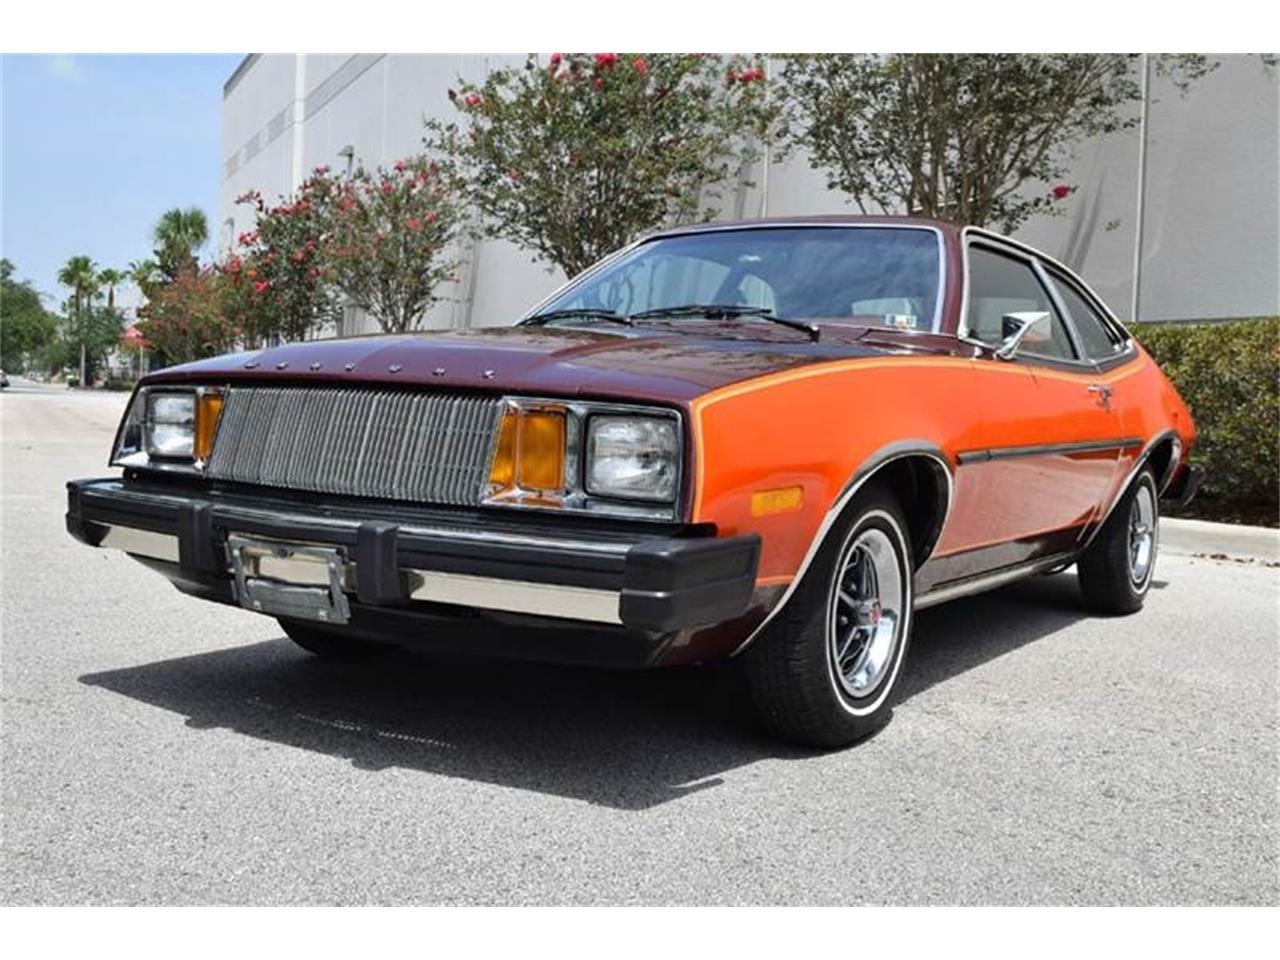 For Sale: 1980 Mercury Bobcat in Orlando, Florida